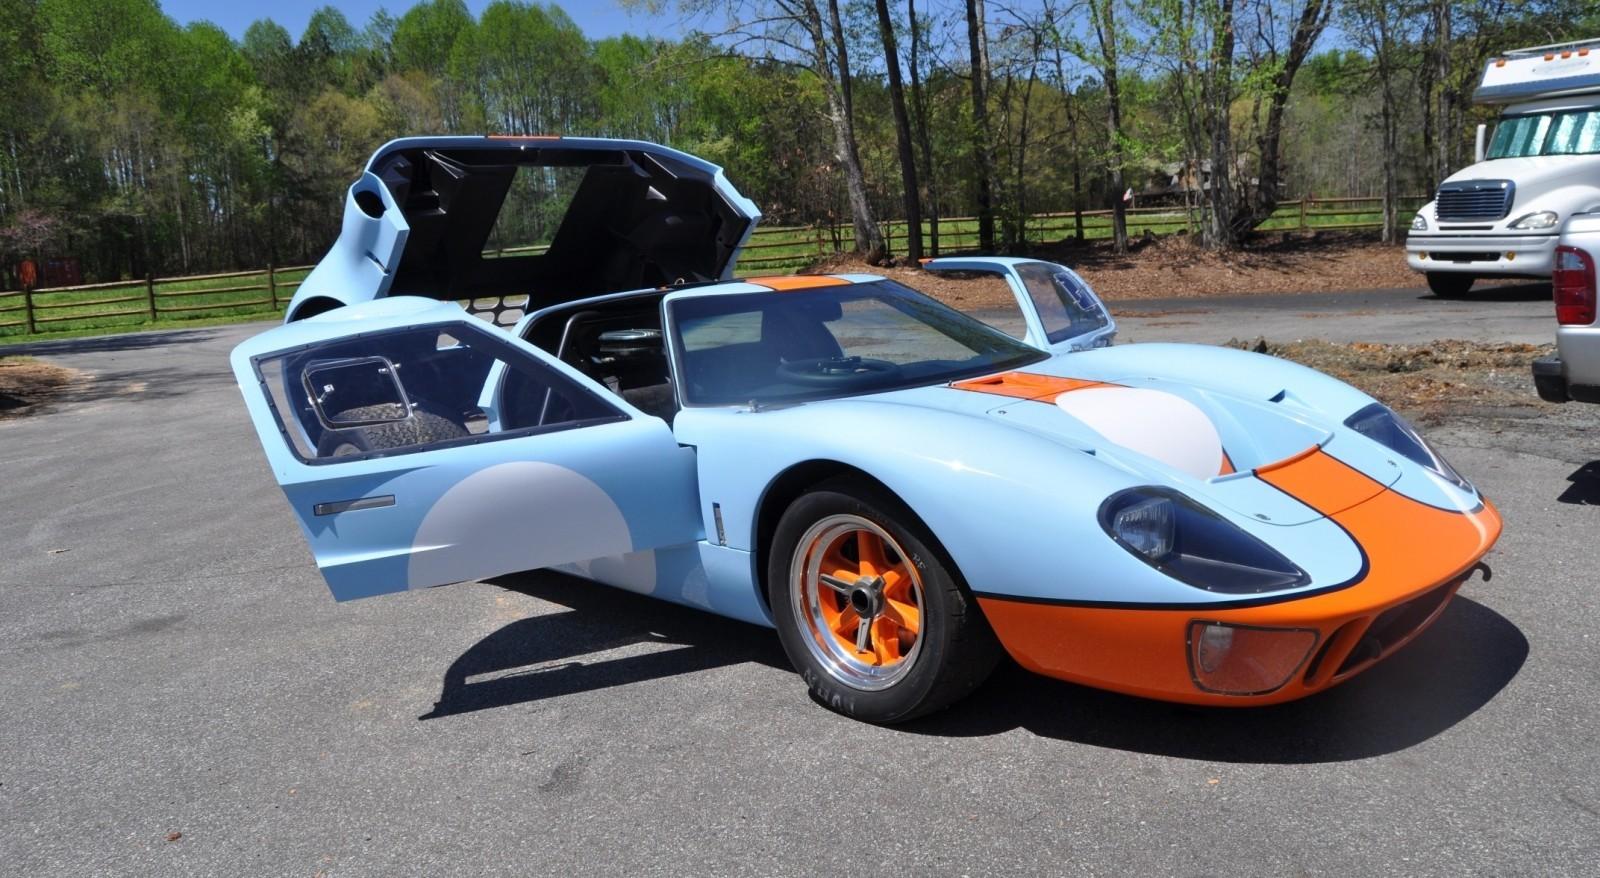 2014 Superformance GT40 Mark I - MEGA Photo Shoot and Ride-Along Videos 69